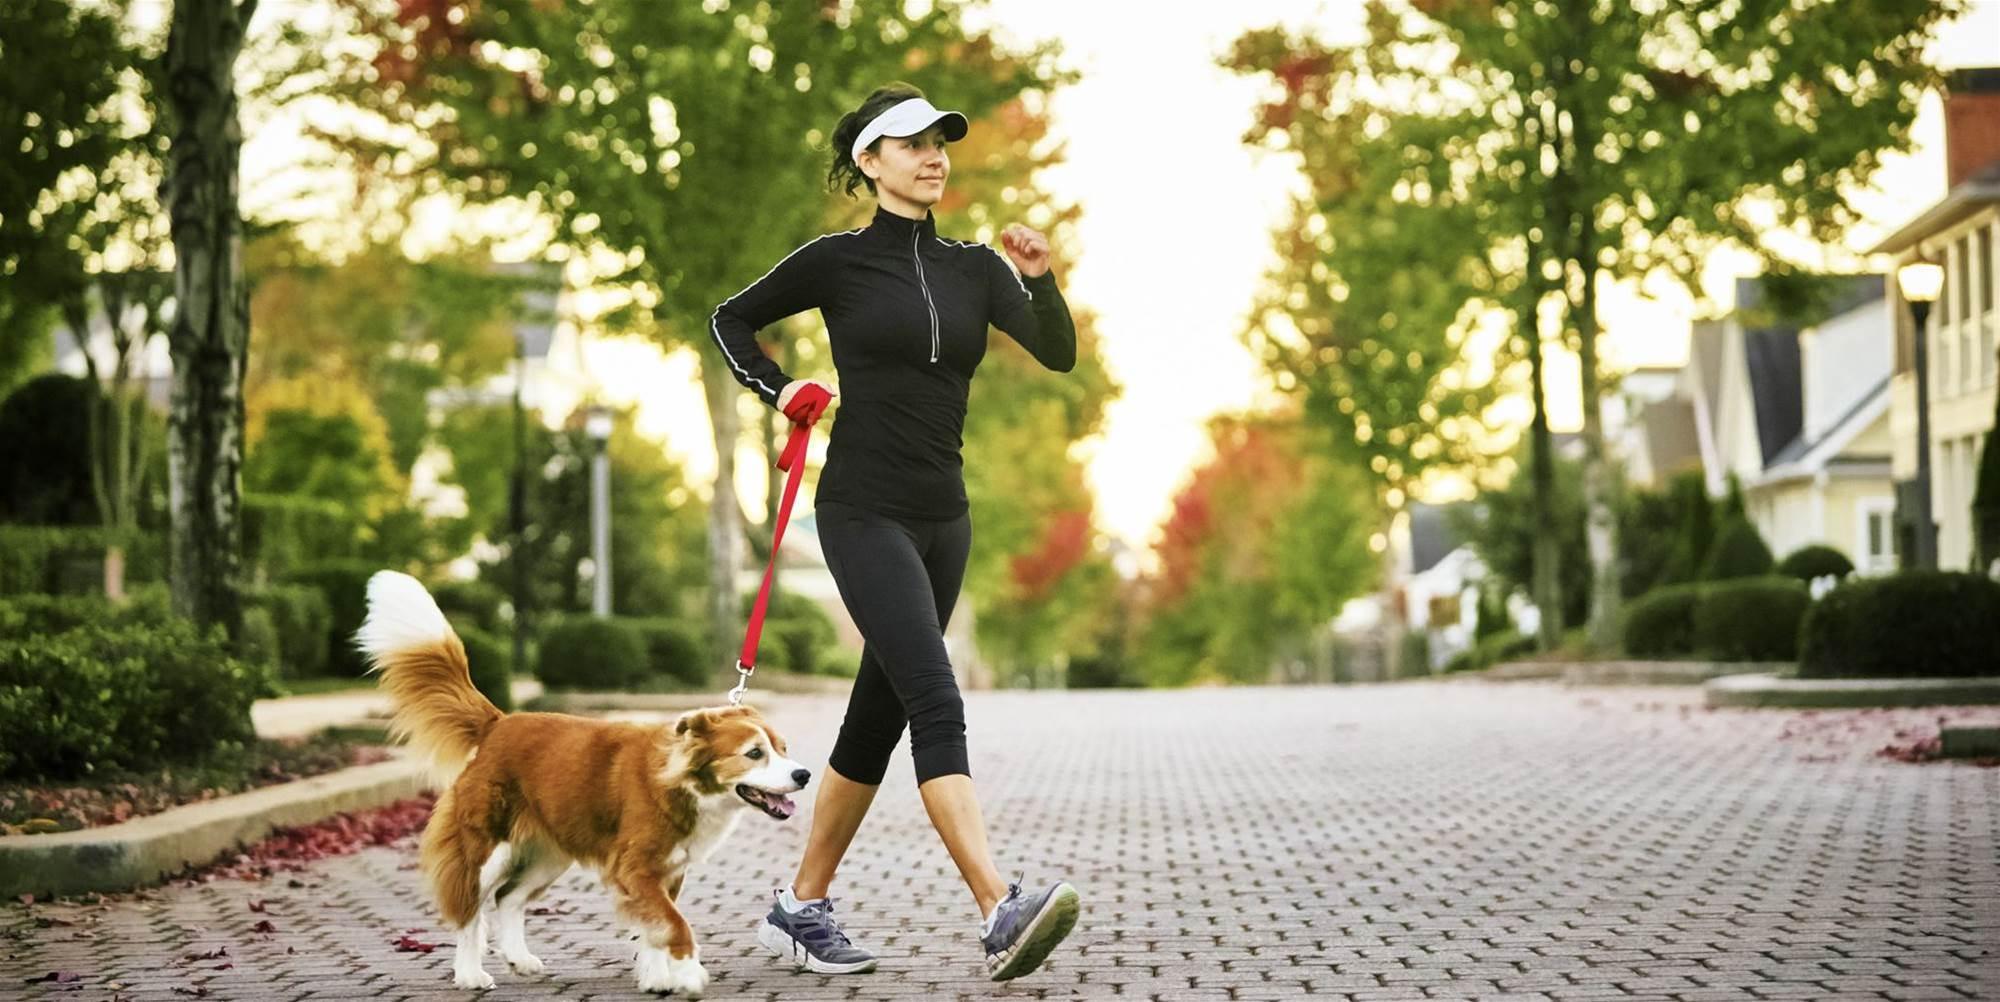 6 Speed Walking Tips to Burn kJs like you're Running